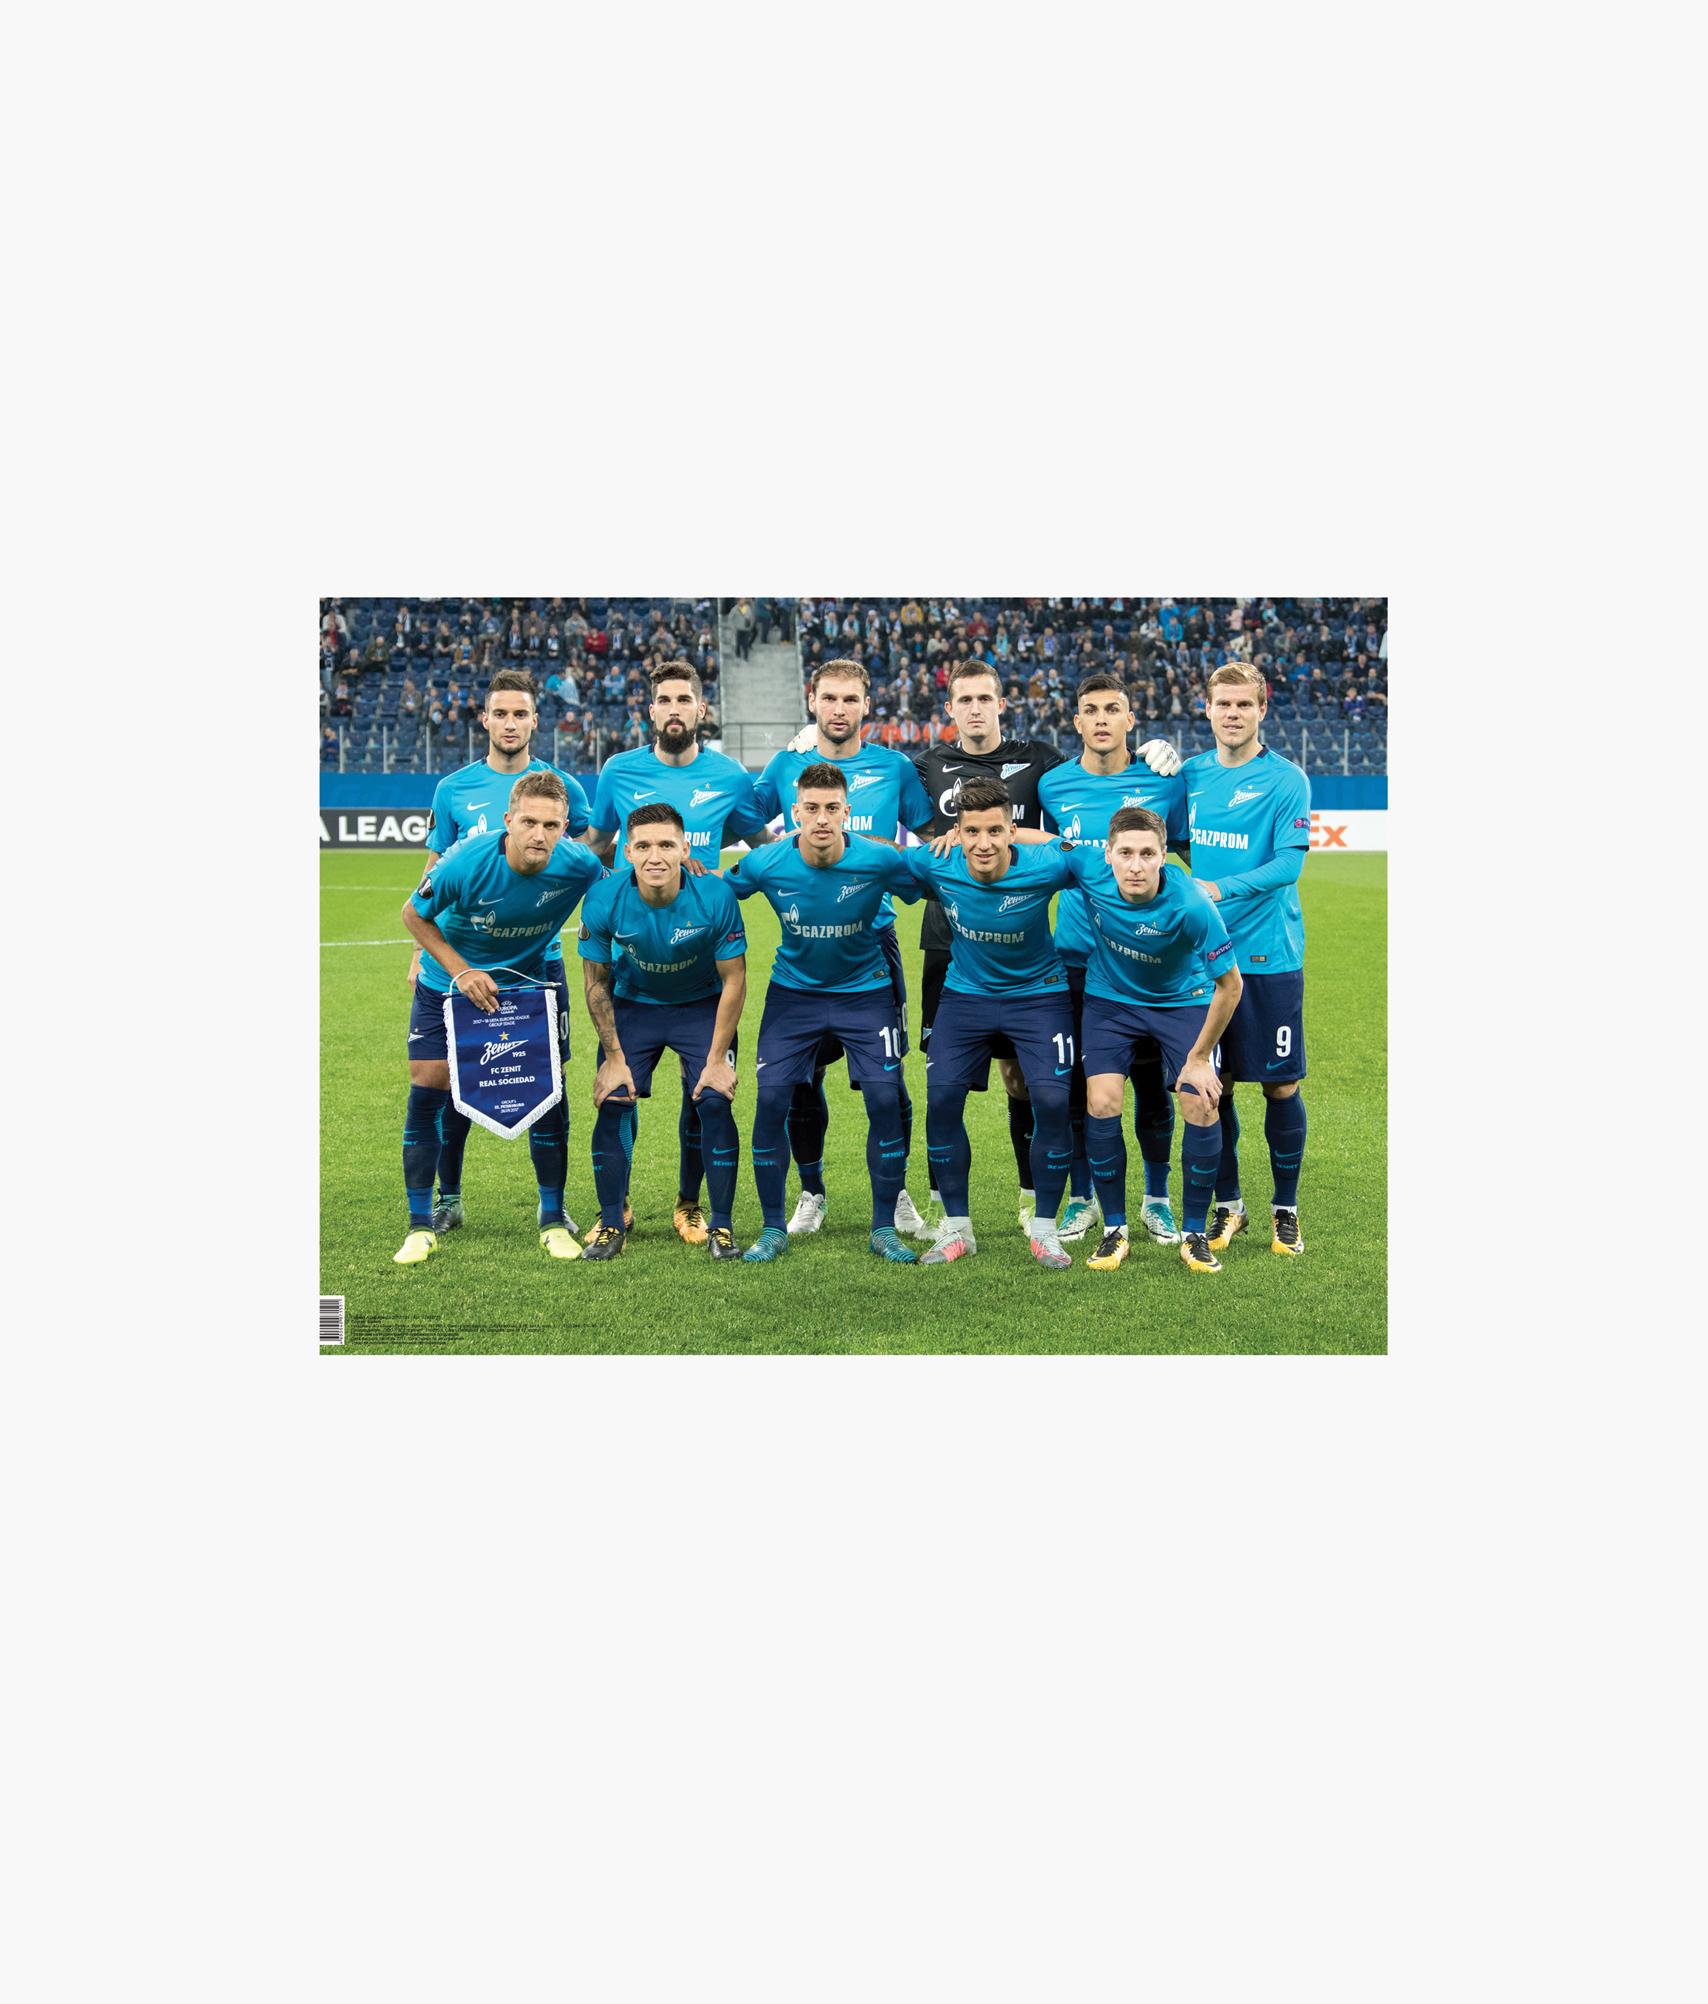 Плакат «Команда 2017/2018» формата А3 Зенит